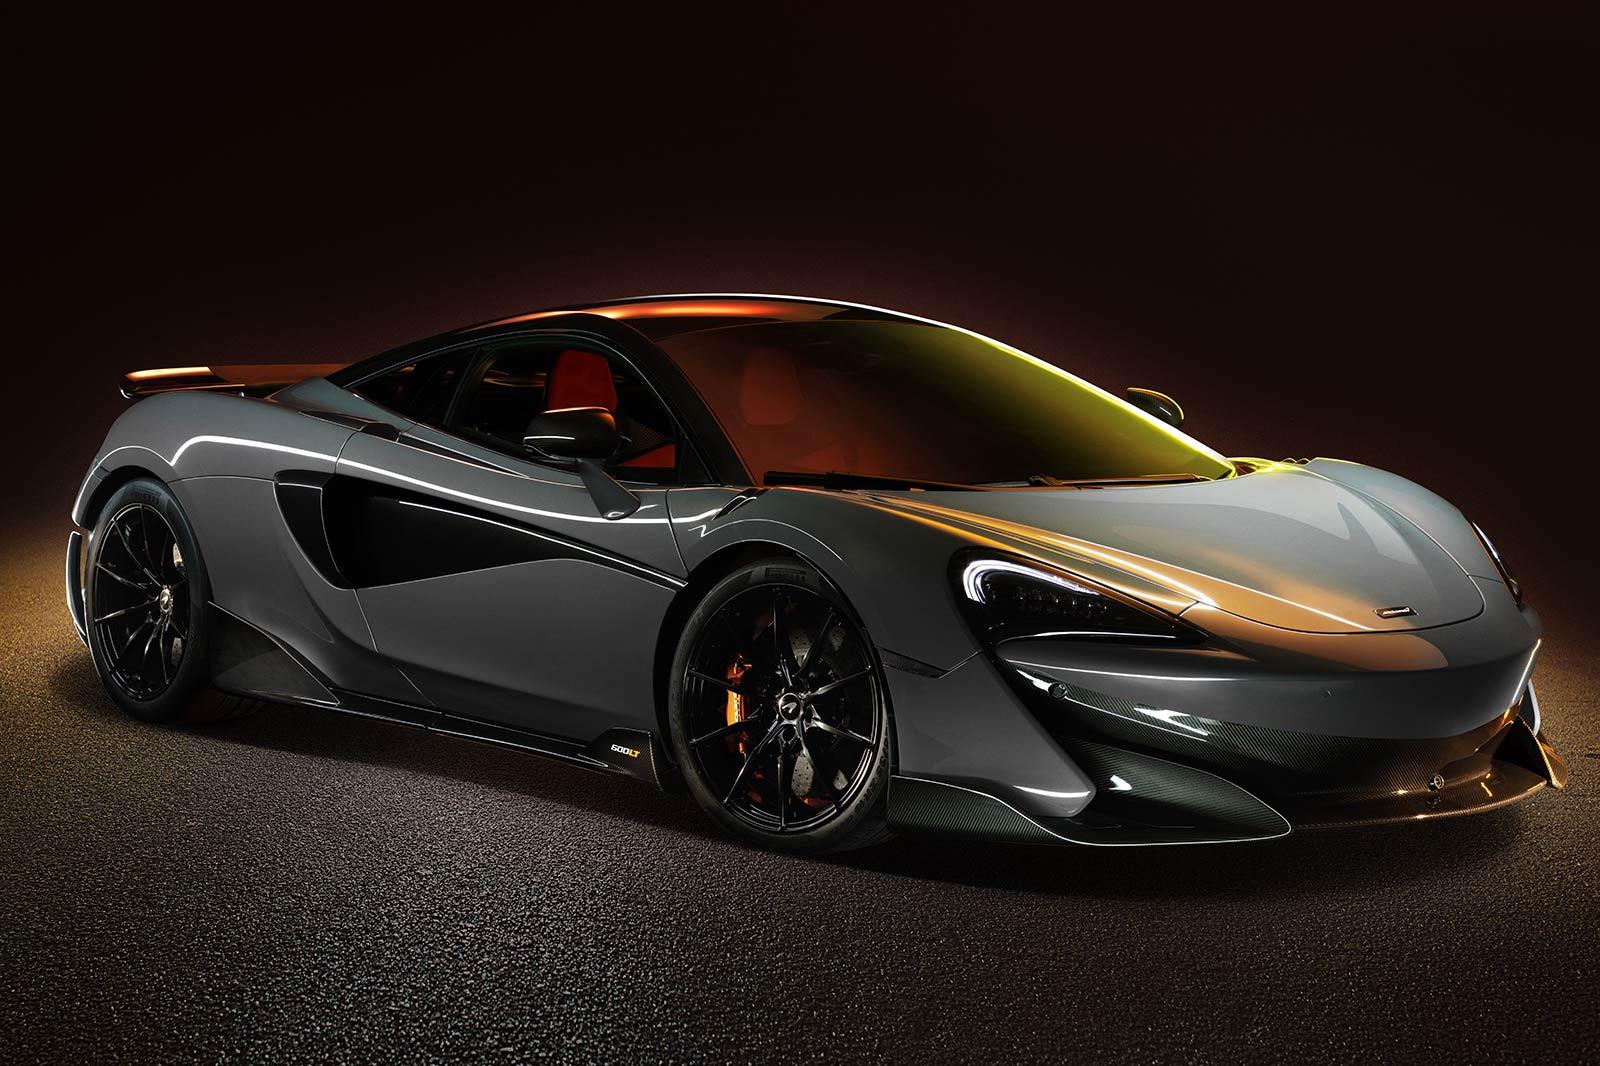 McLaren Longtail 600LT